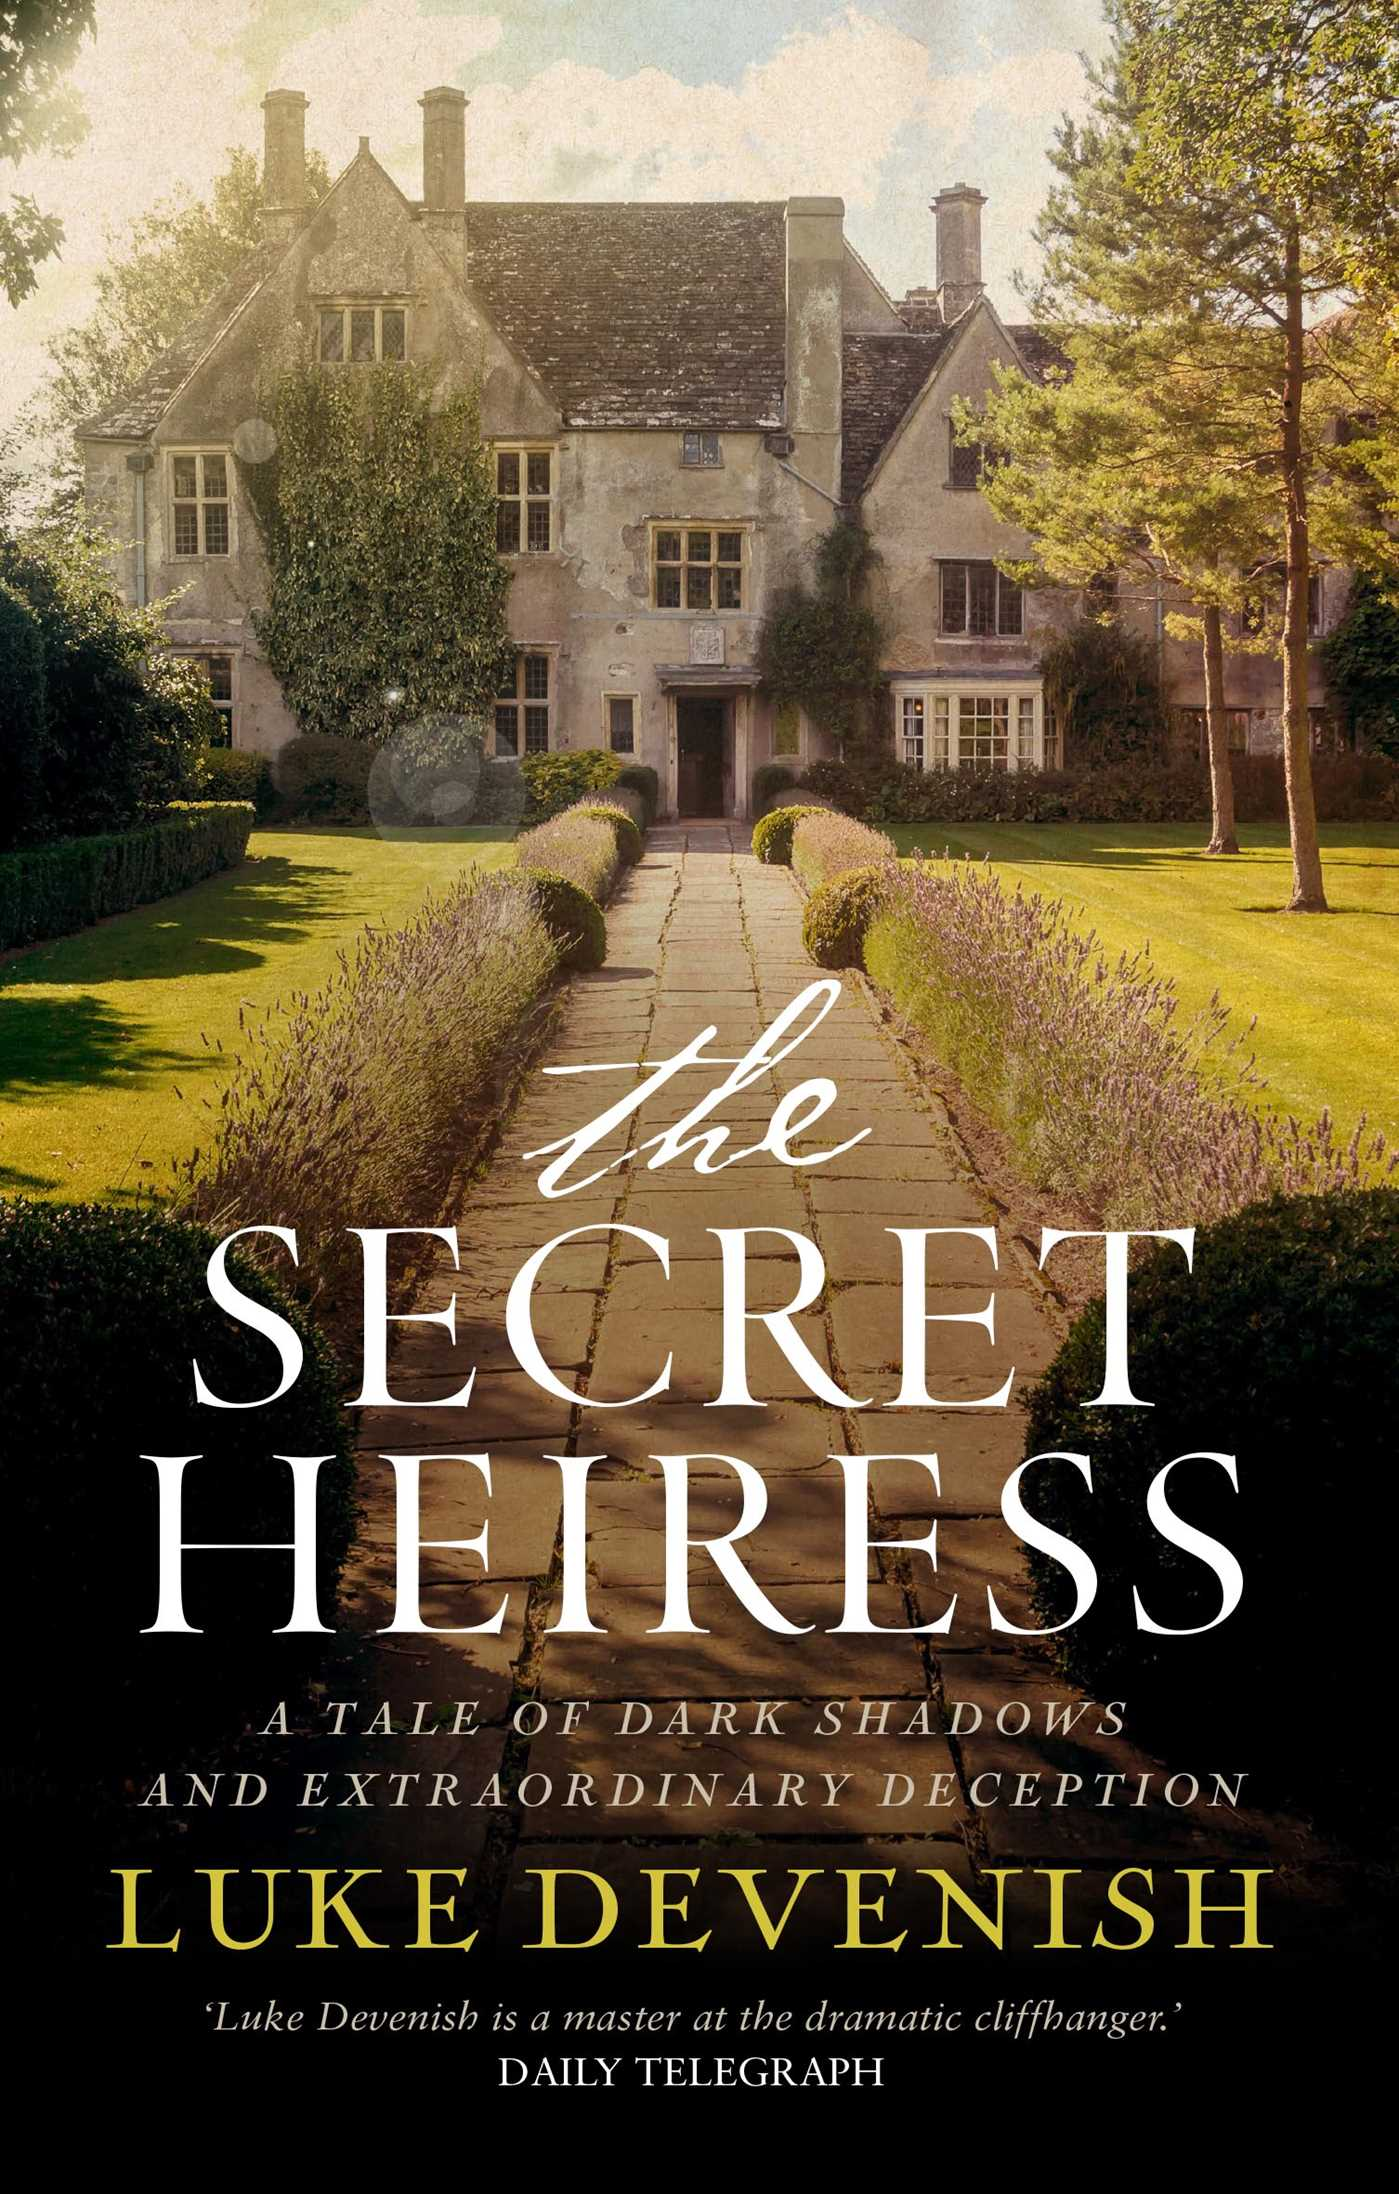 Secret heiress 9781922052162 hr